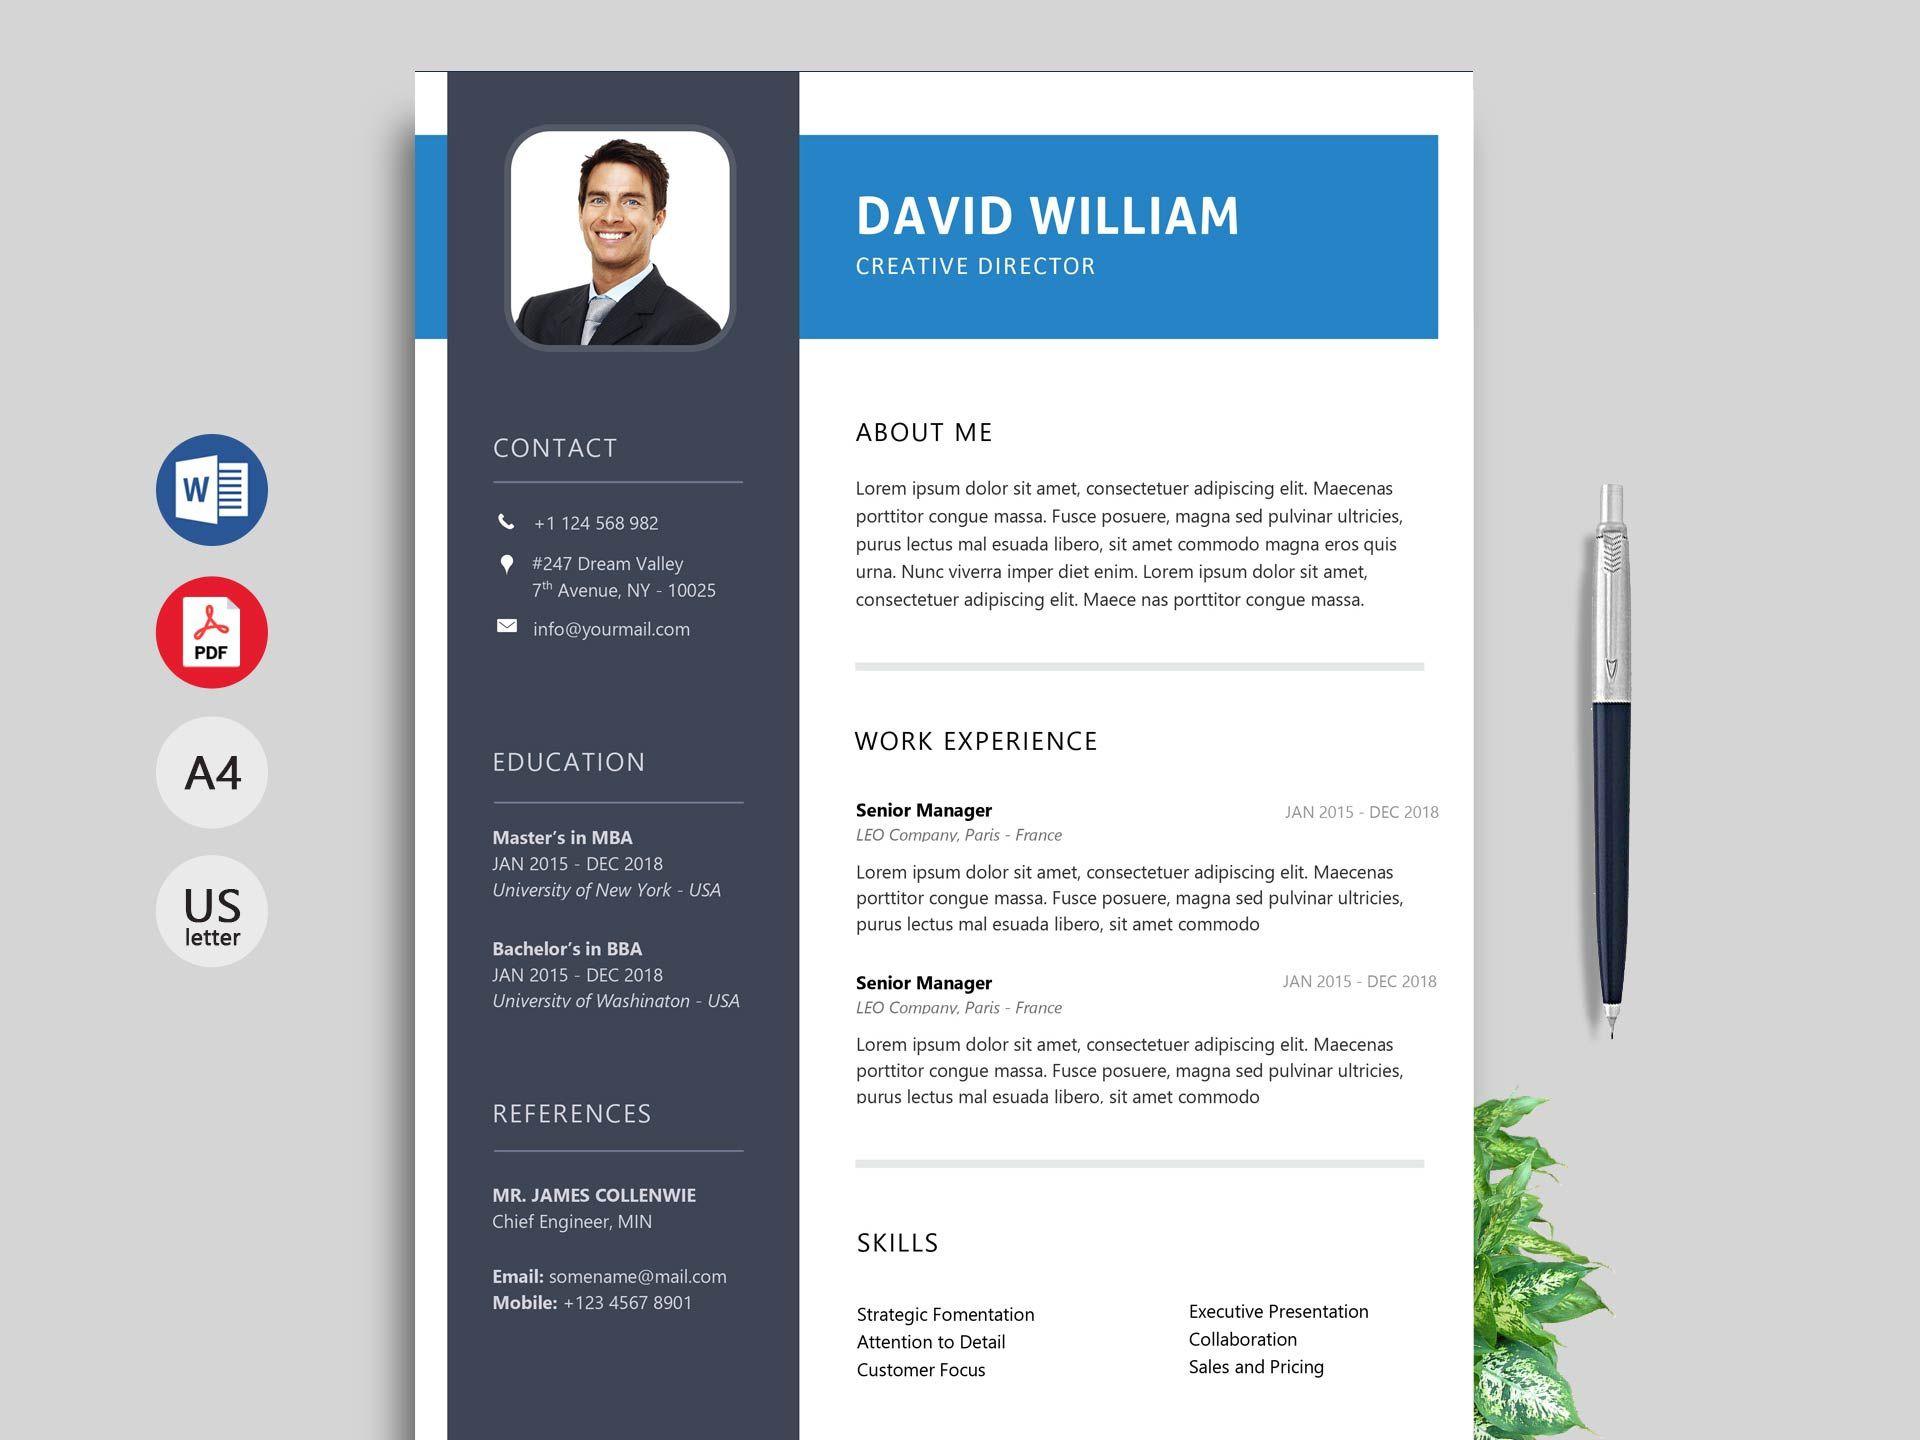 010 Remarkable Resume Template Word Free Download 2019 Design  CvFull